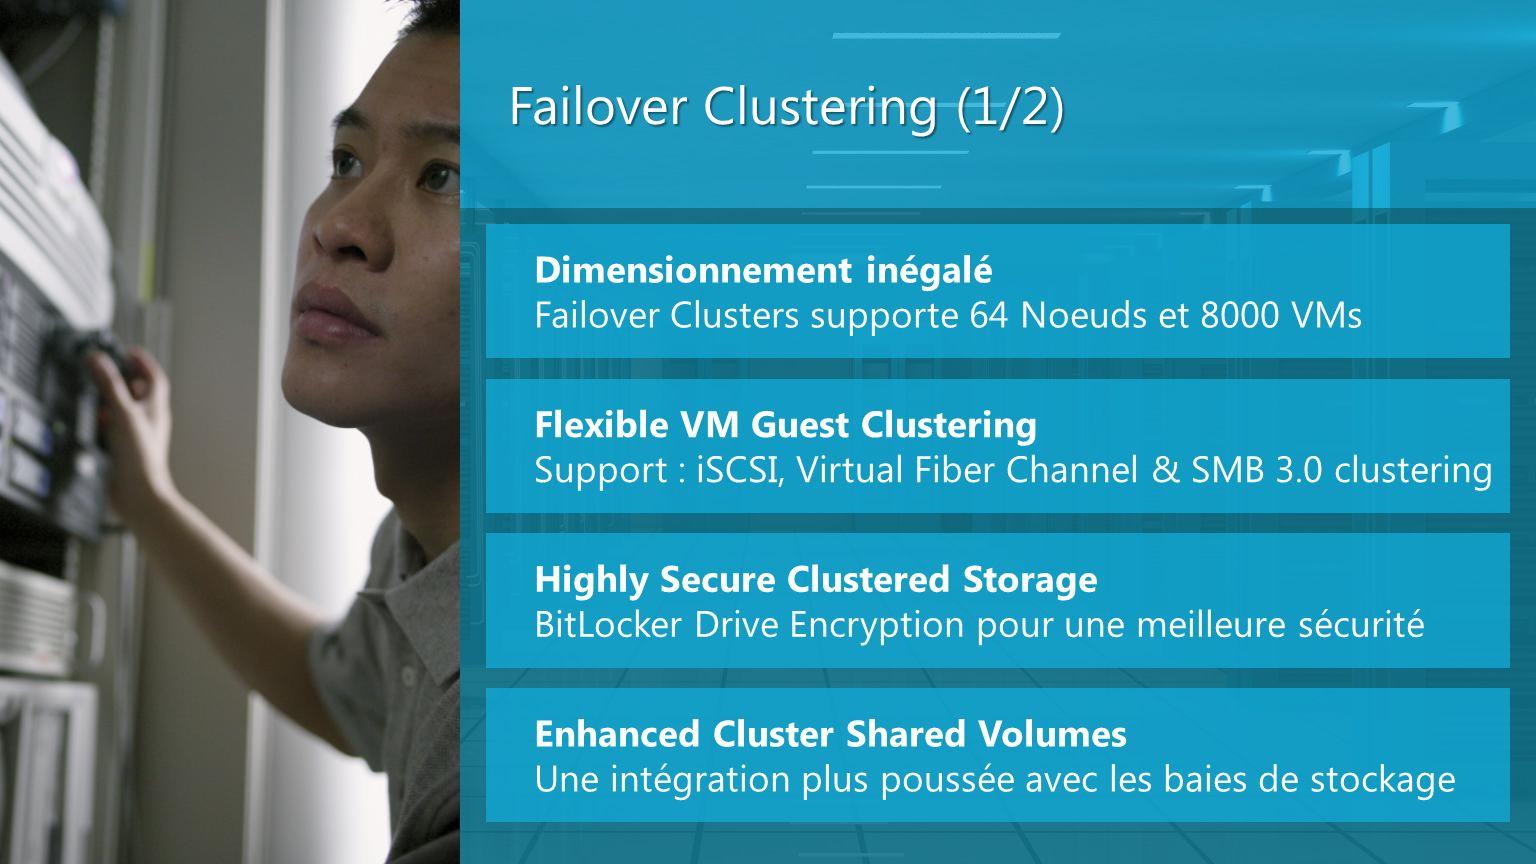 Failover Clustering (1/2)